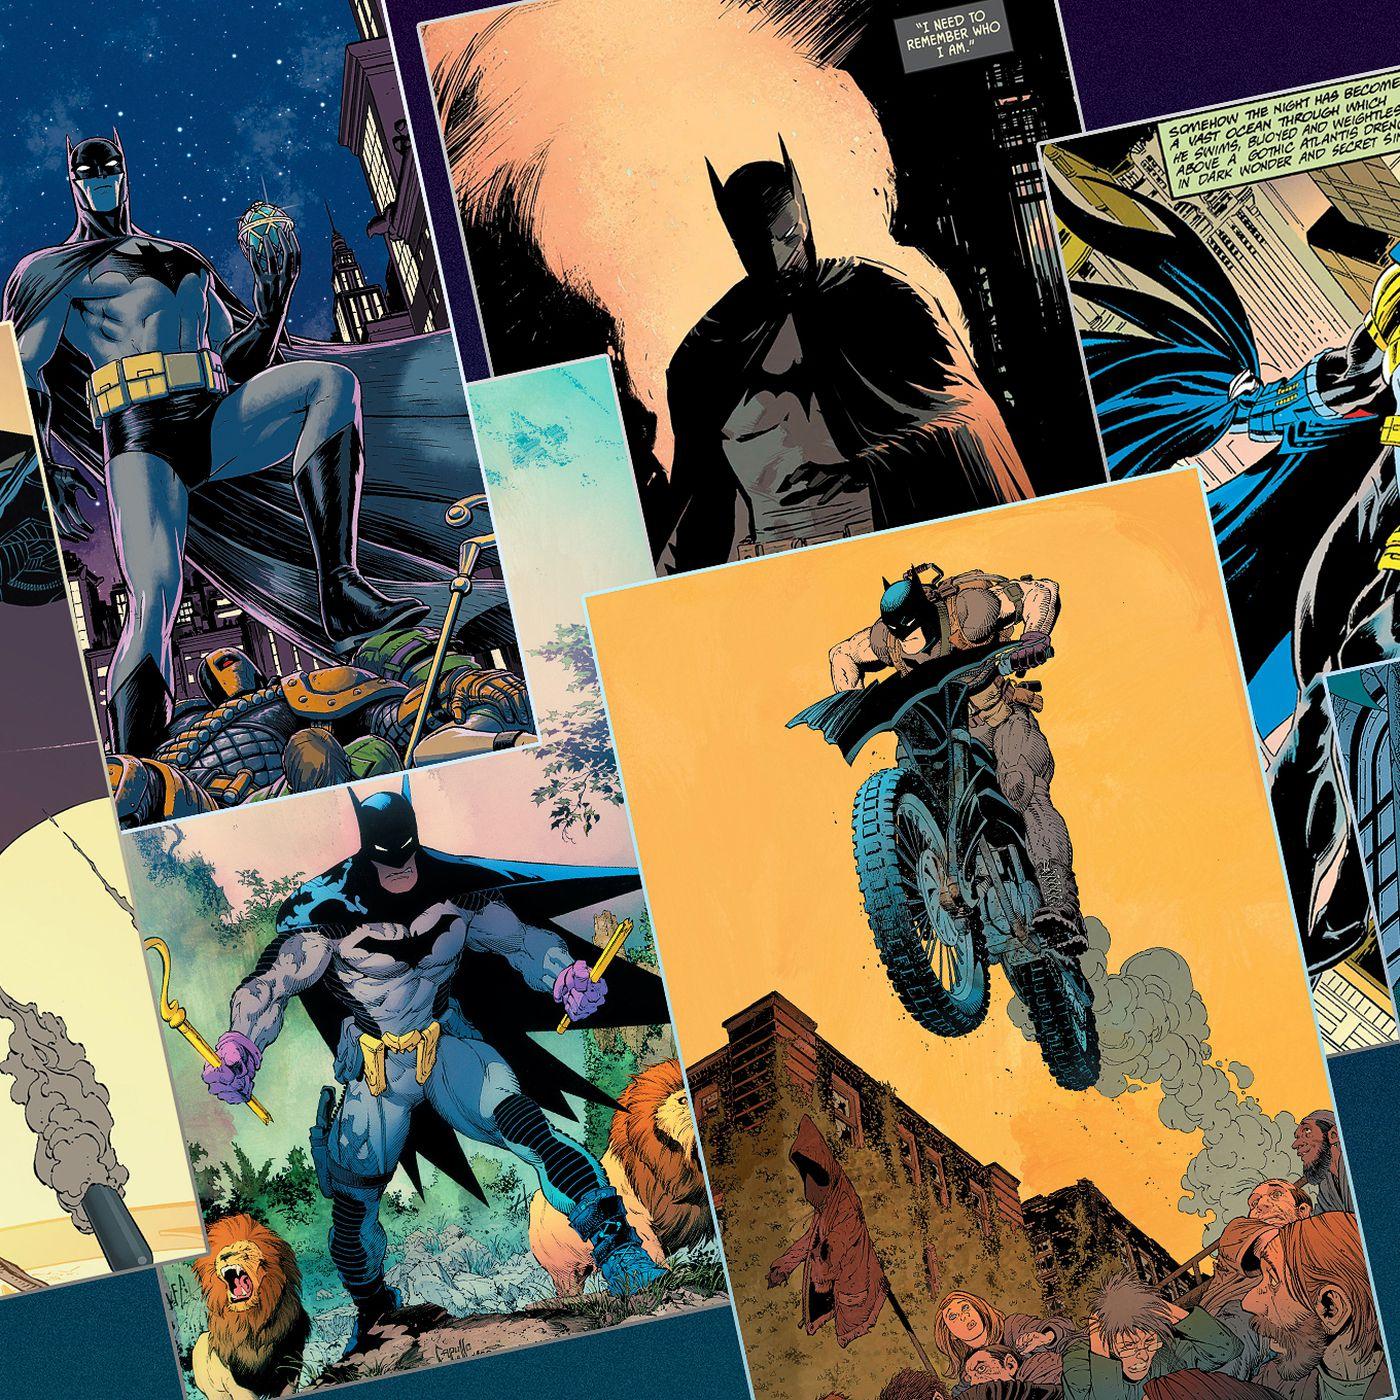 gloves cape REAL black utility belt BATMAN The Dark Knight Rises costume cowl